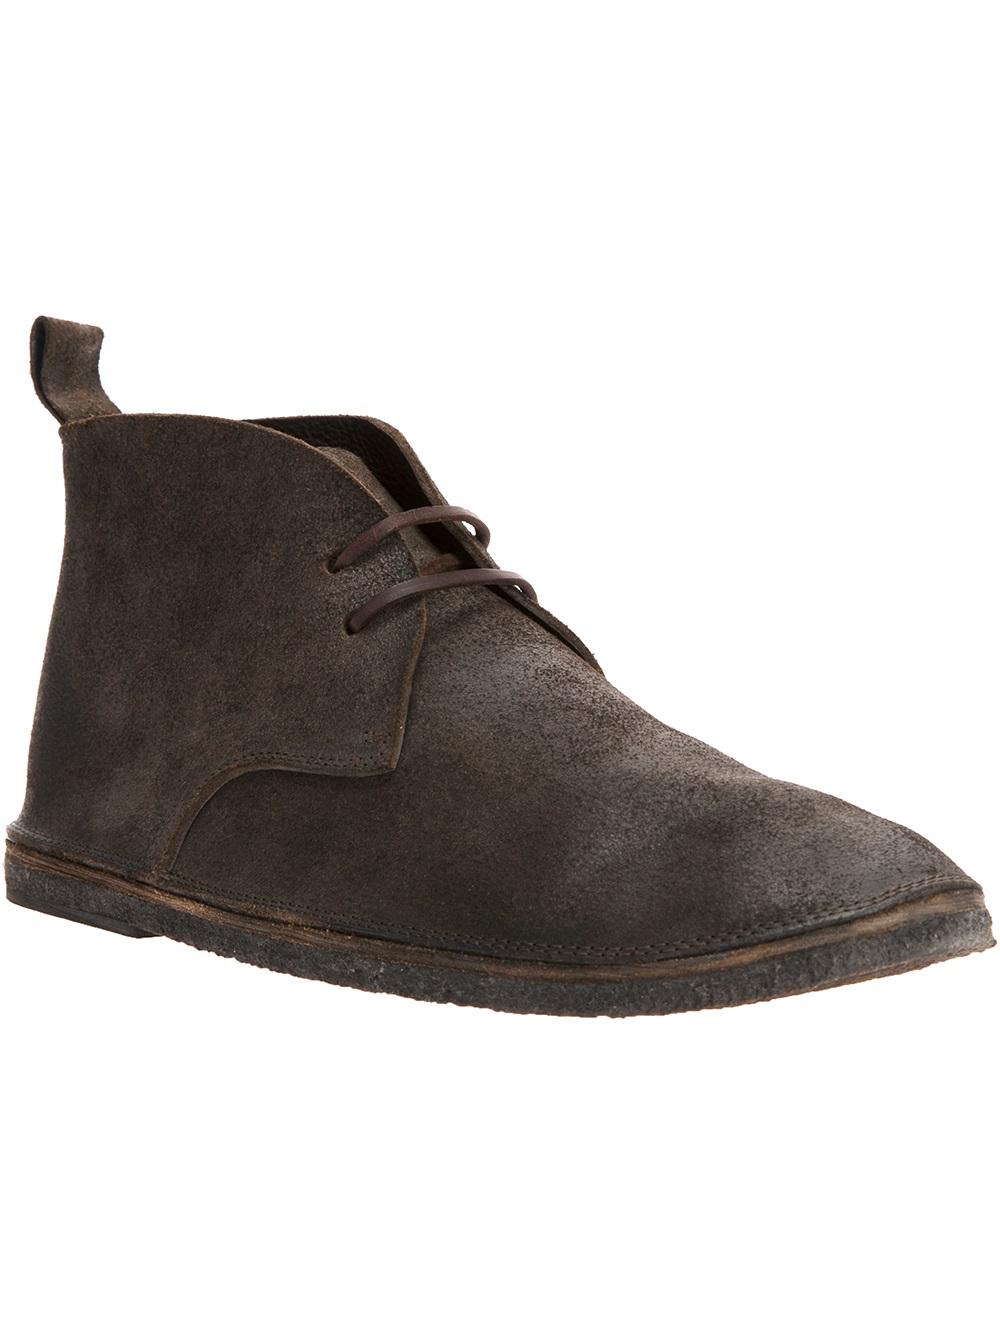 dc332c16186446 Lyst - Marsèll Classic Desert Boot in Brown for Men